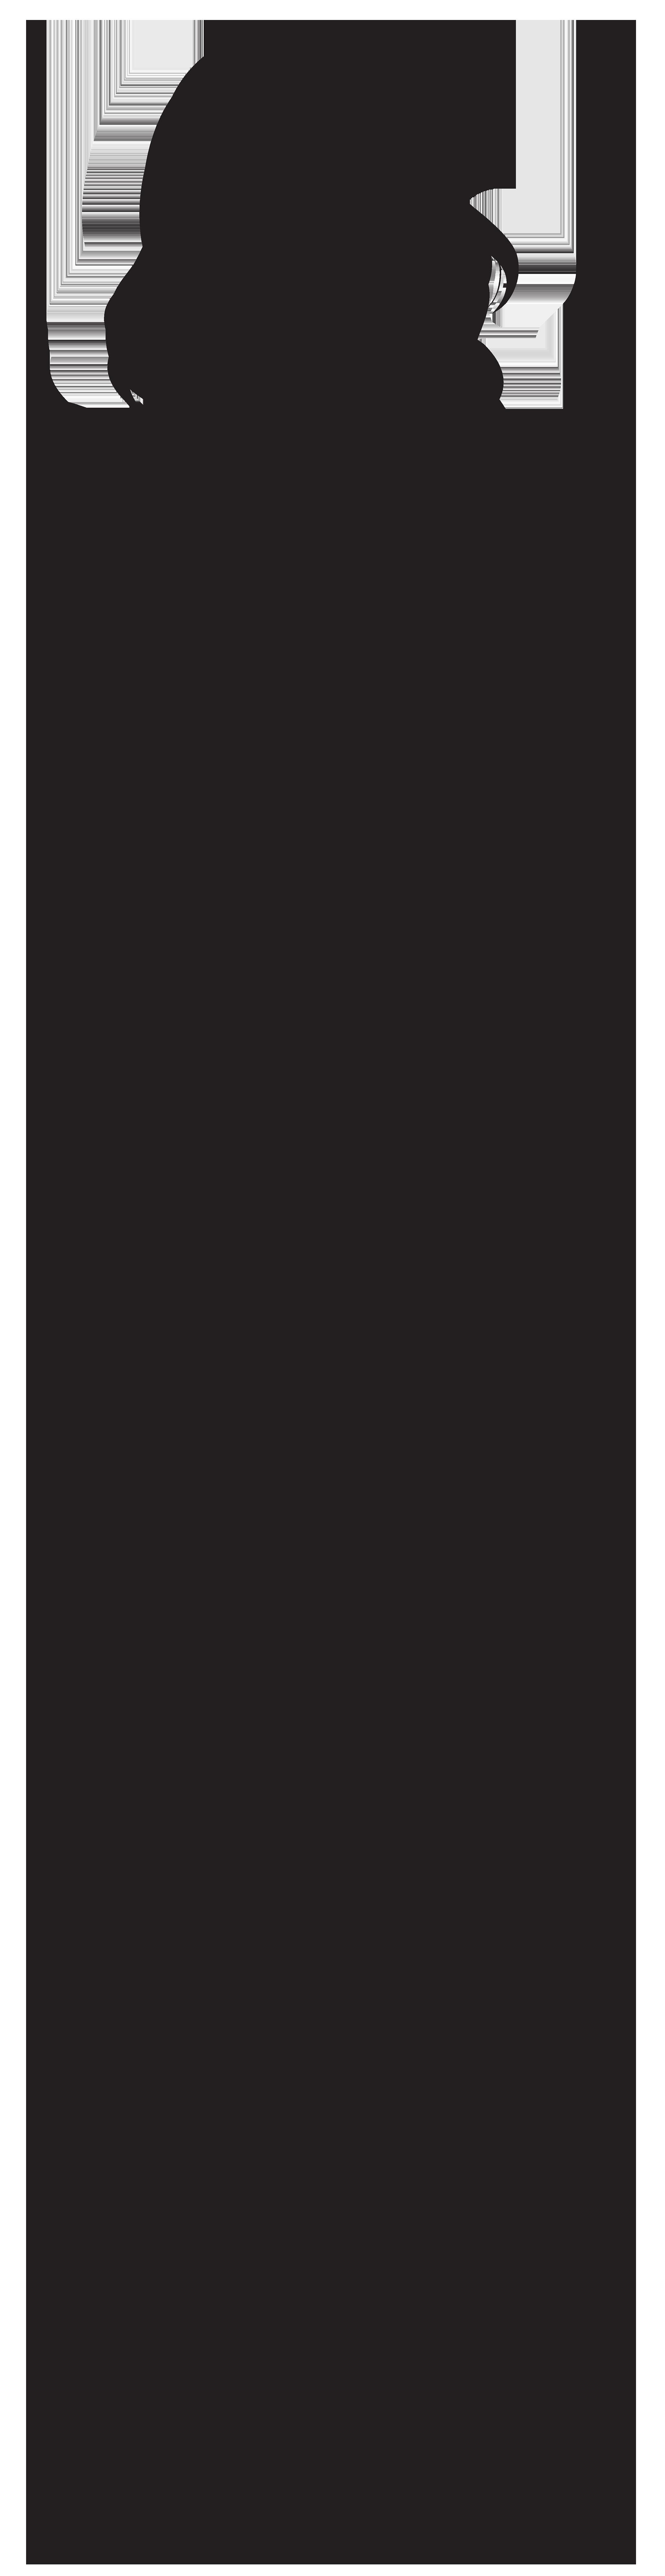 Woman Silhouette PNG Clip Art Image.